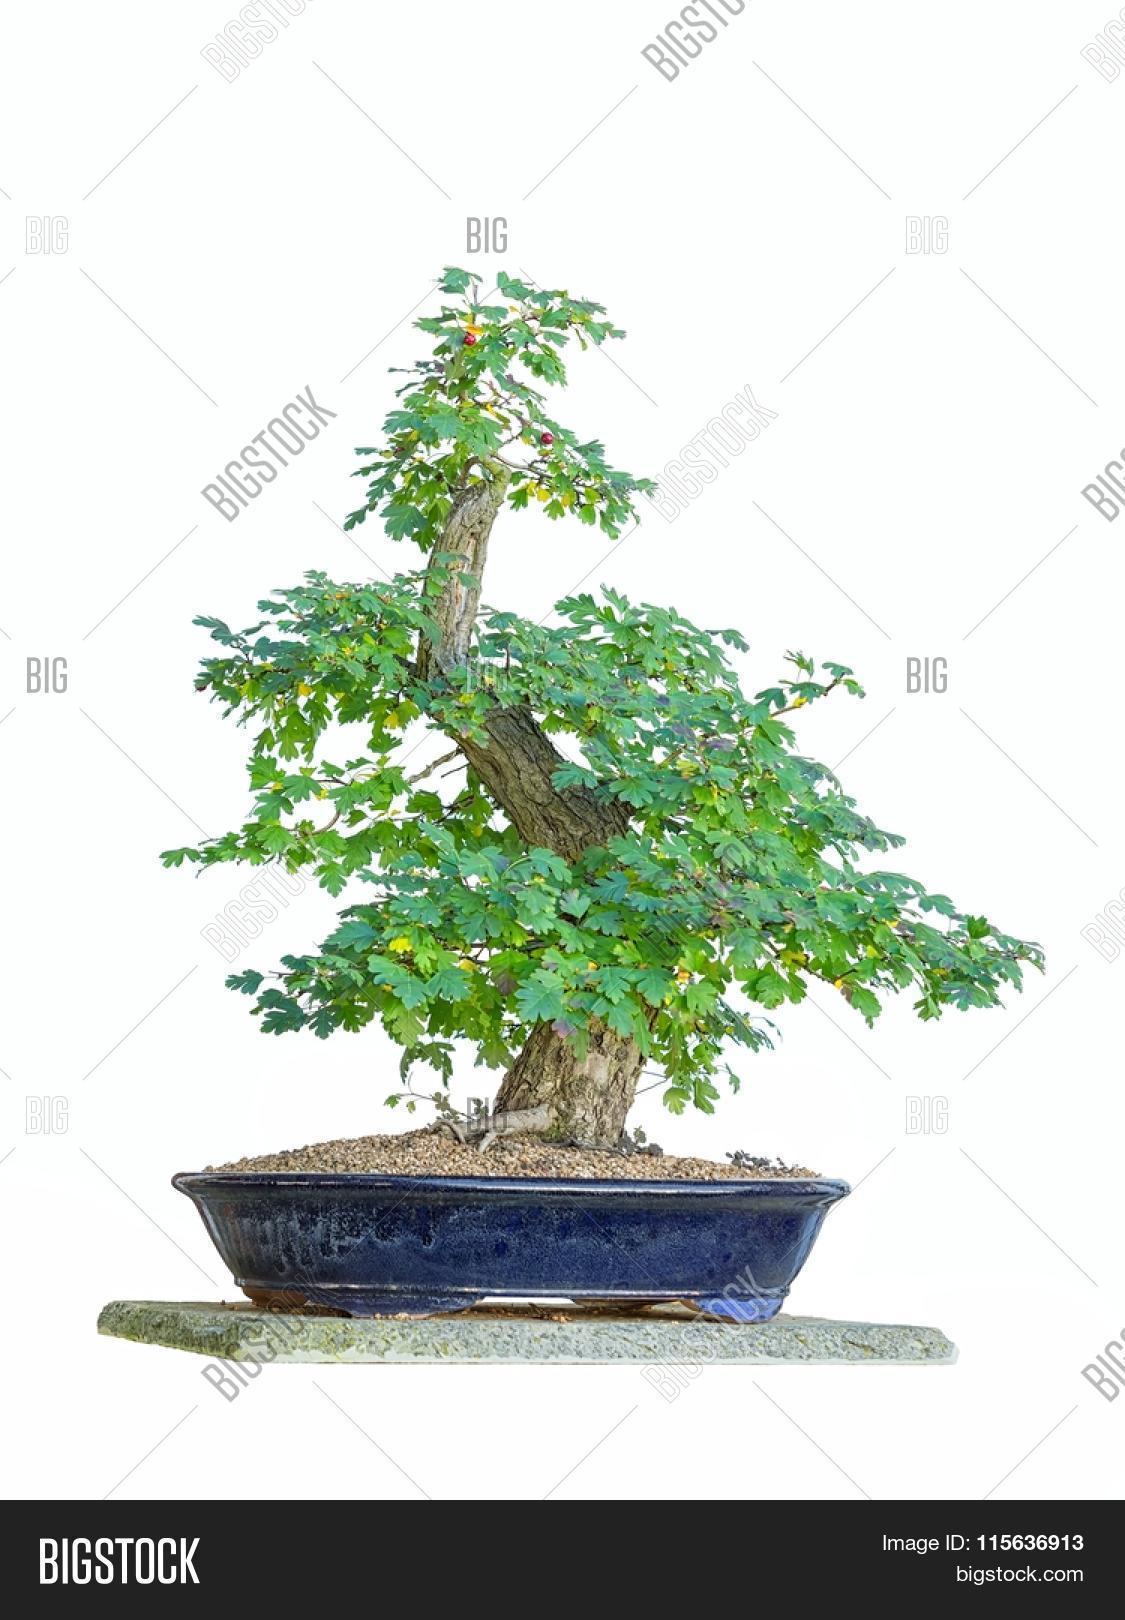 Bonsai Tree White Image Photo Free Trial Bigstock